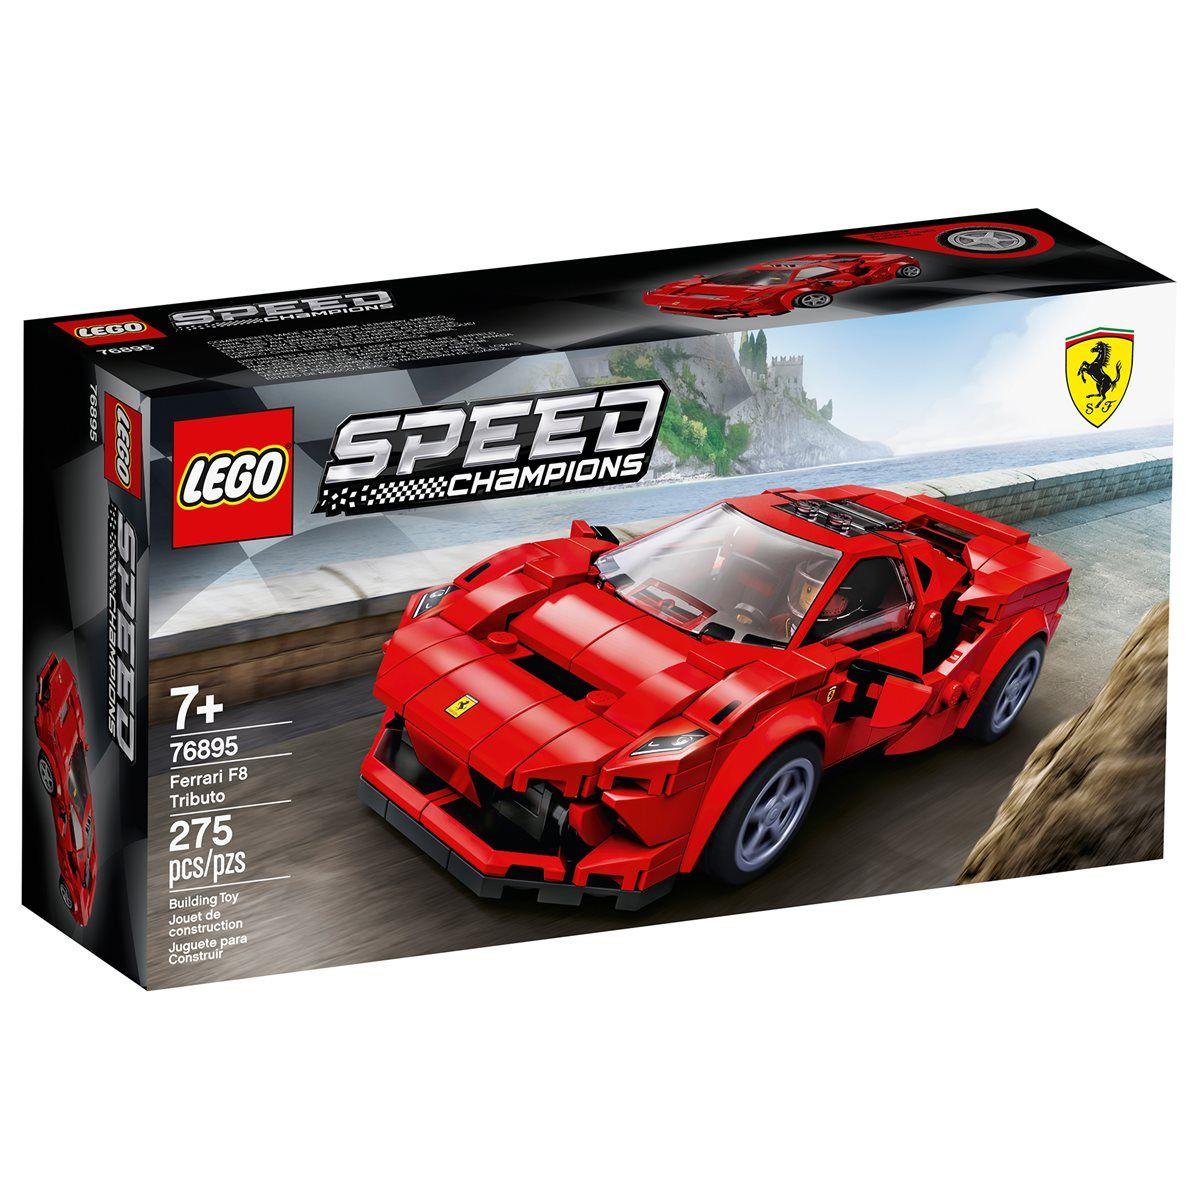 Lego 76895 Speed Champions Ferrari F8 Tributo Lego Speed Champions Toy Model Cars Toy Car